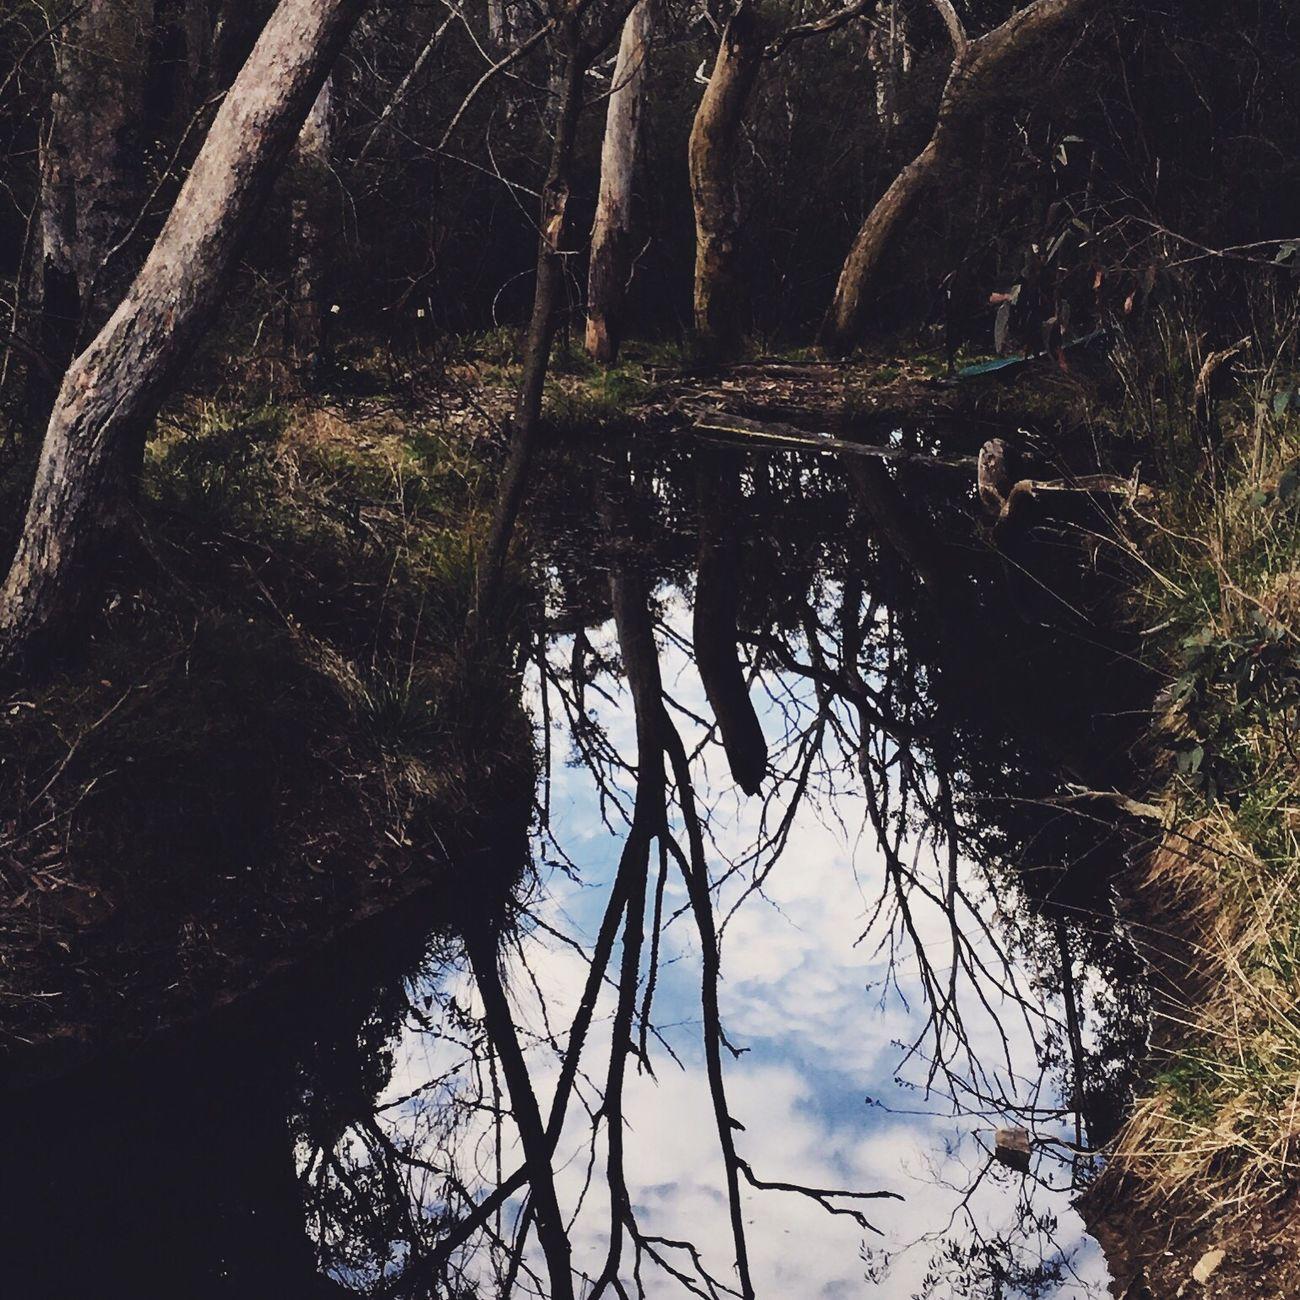 Reflection WoodLand No People Nature